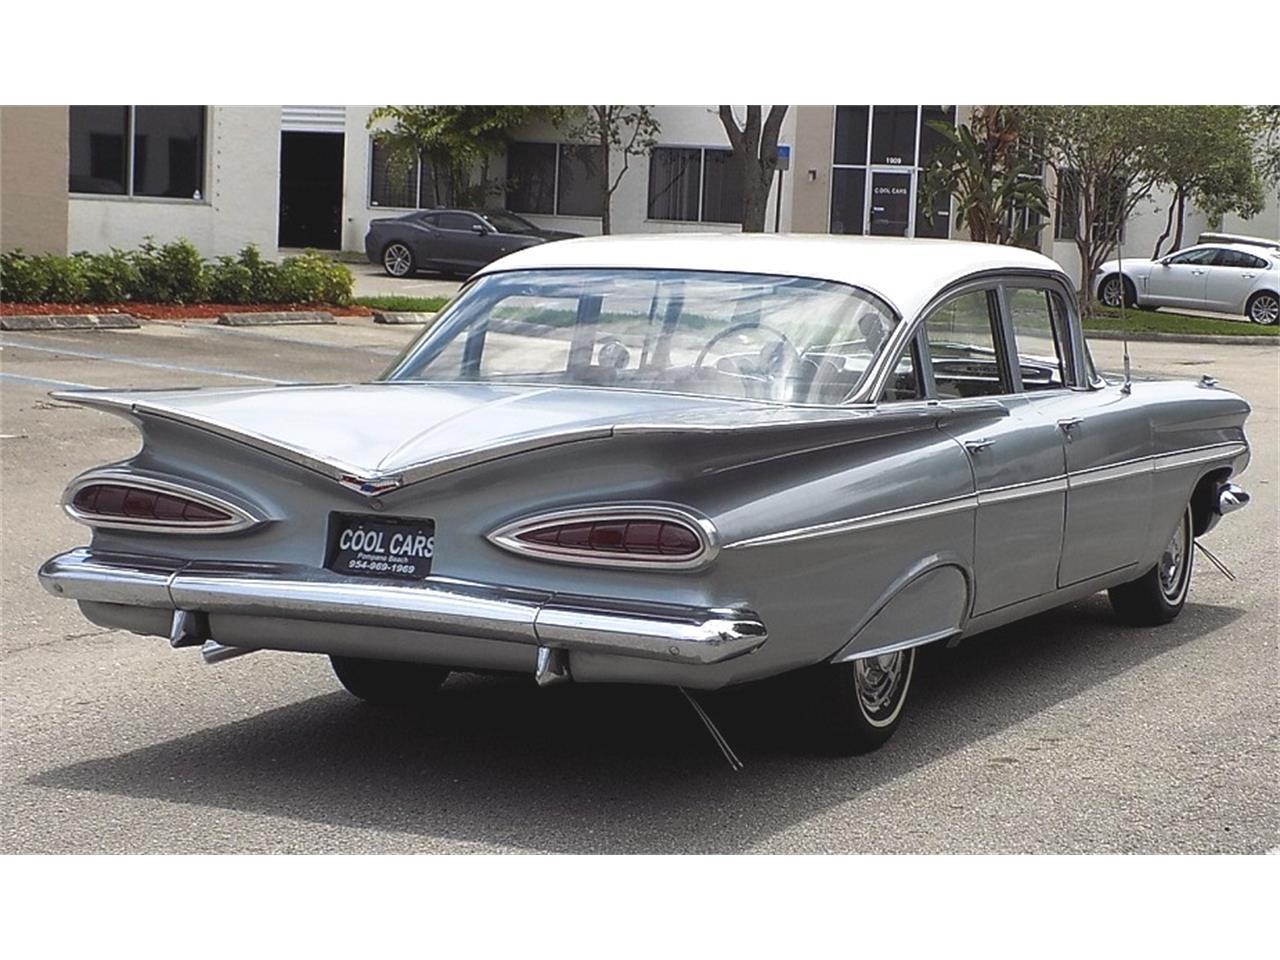 Kelebihan Chevrolet 1959 Top Model Tahun Ini